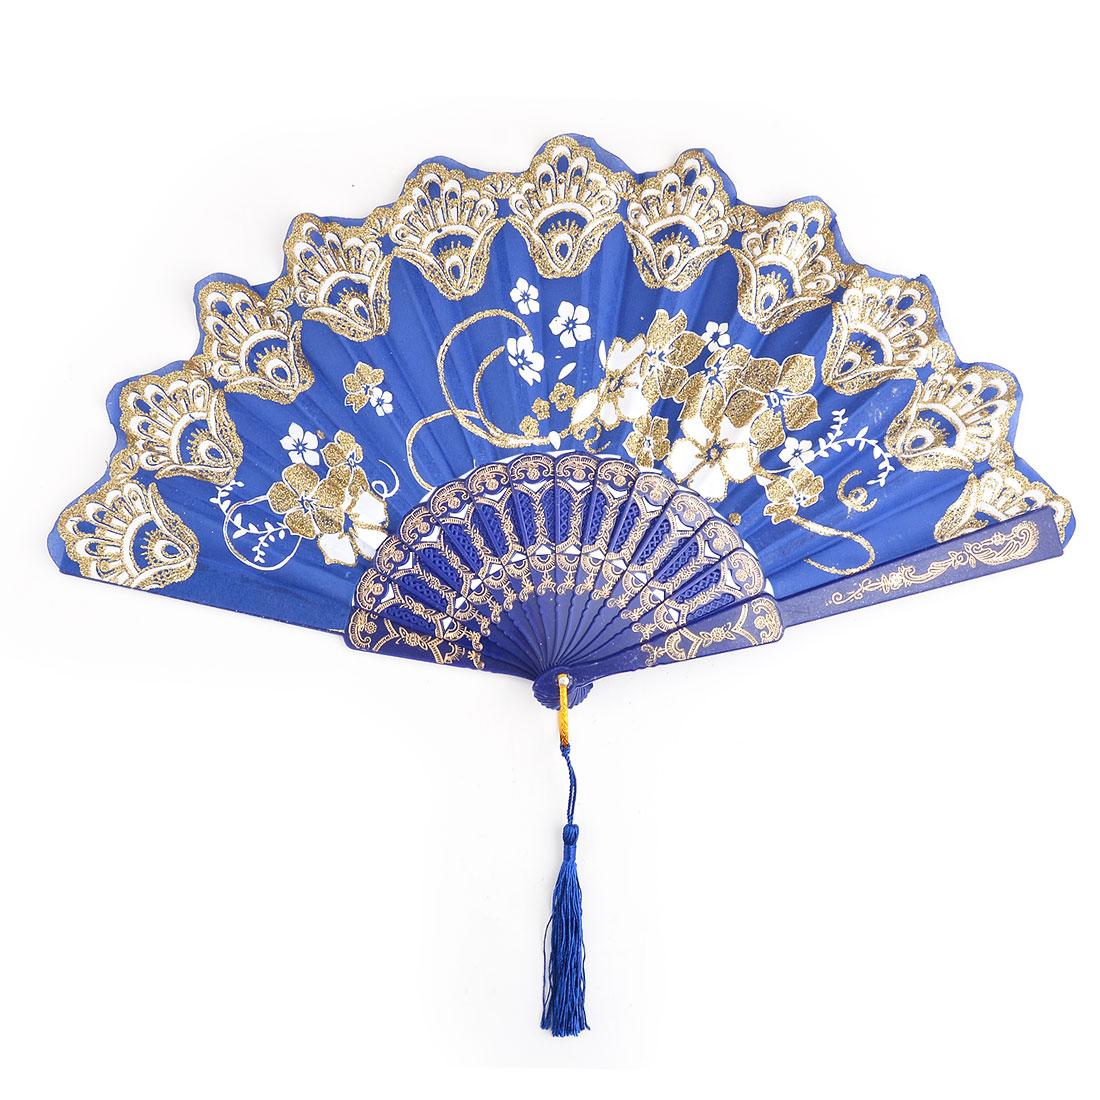 Household Wedding Plastic Cherryblossom Pattern Folding Cooling Dancing Hand Fan Dark Blue